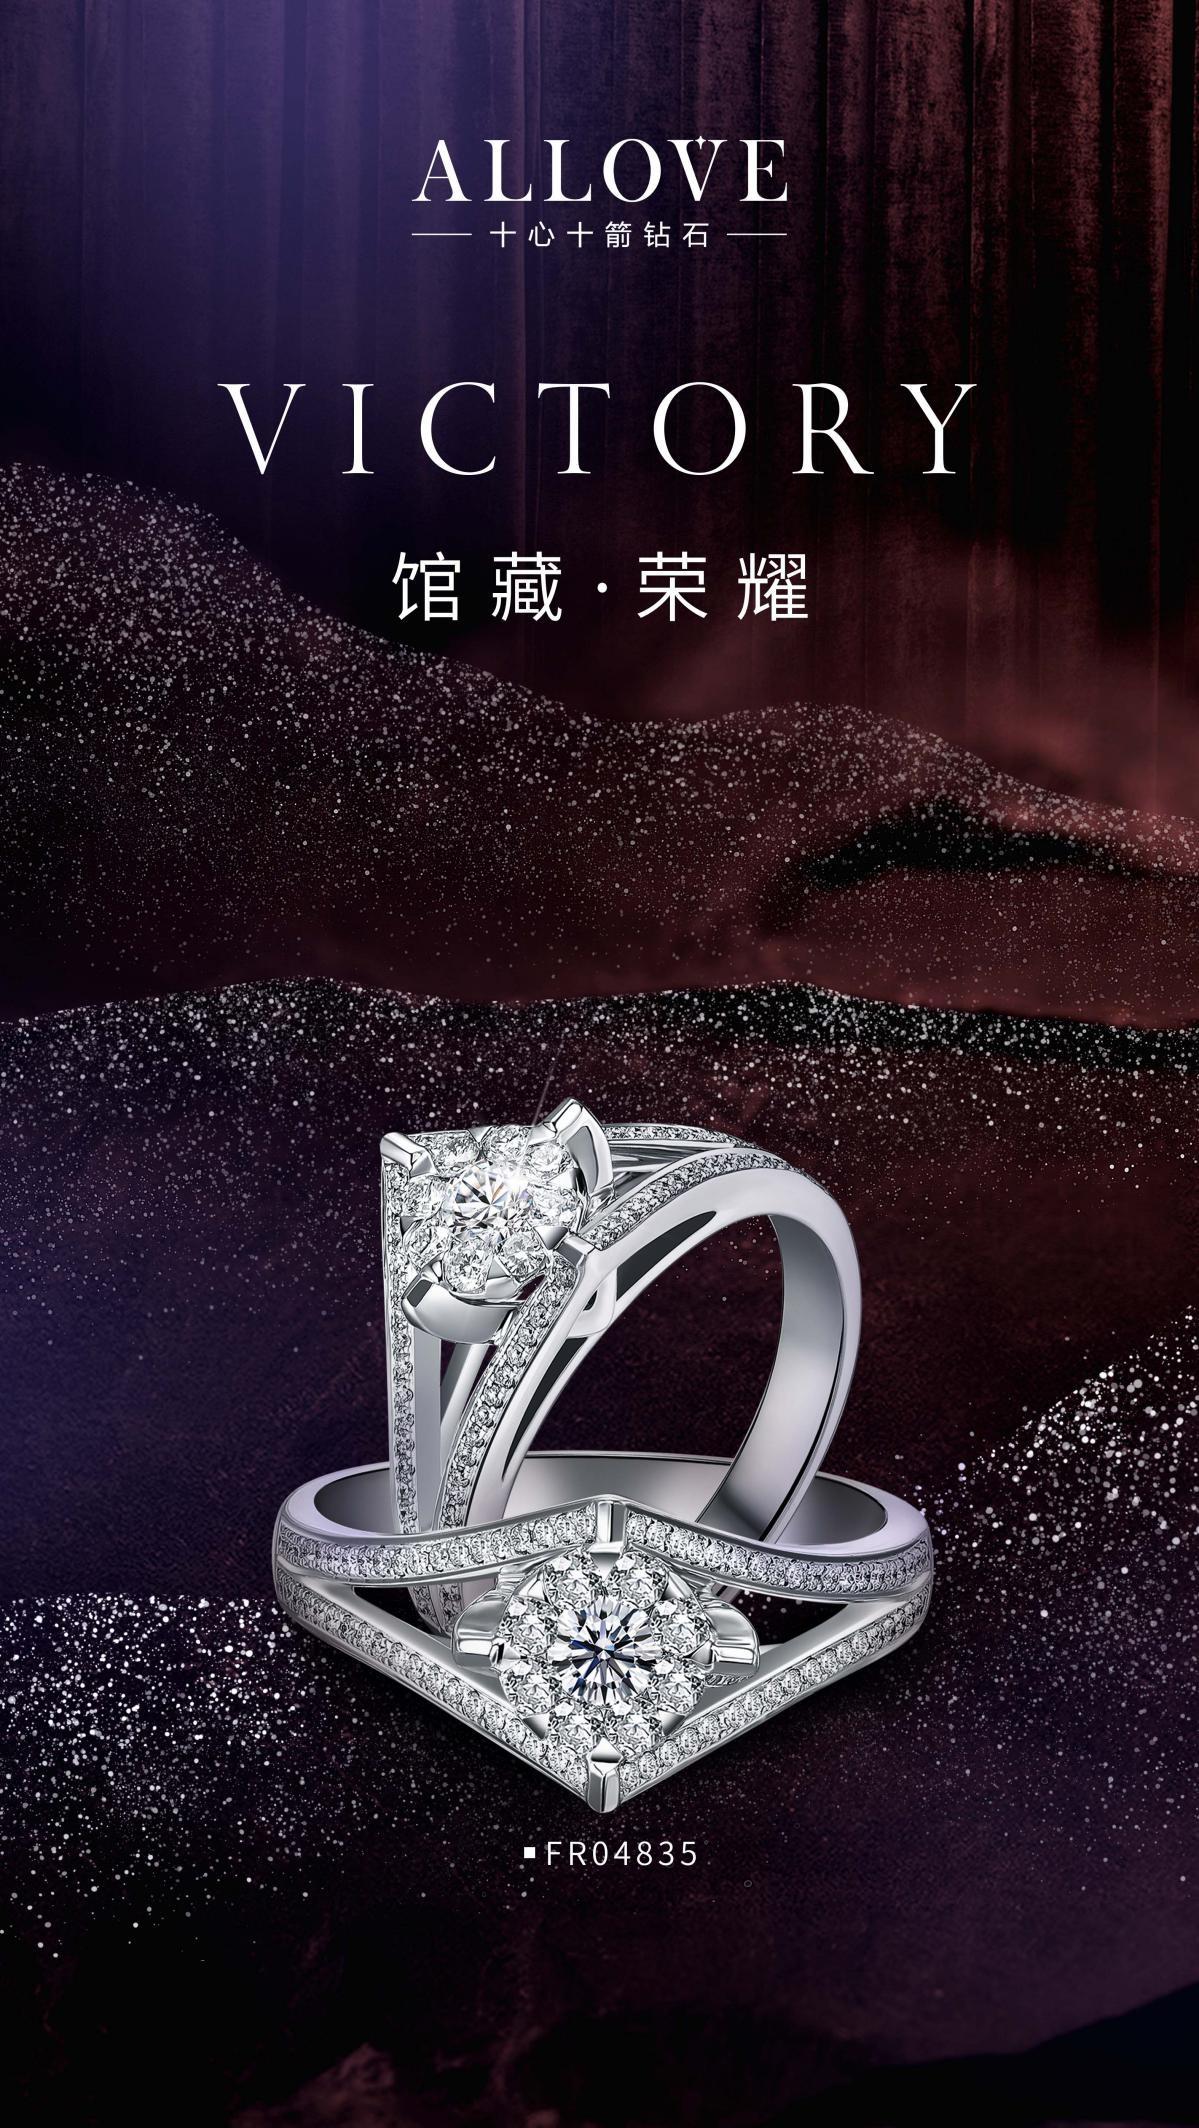 ALLOVE十心十箭钻石,赠给挚爱之人的完美礼物